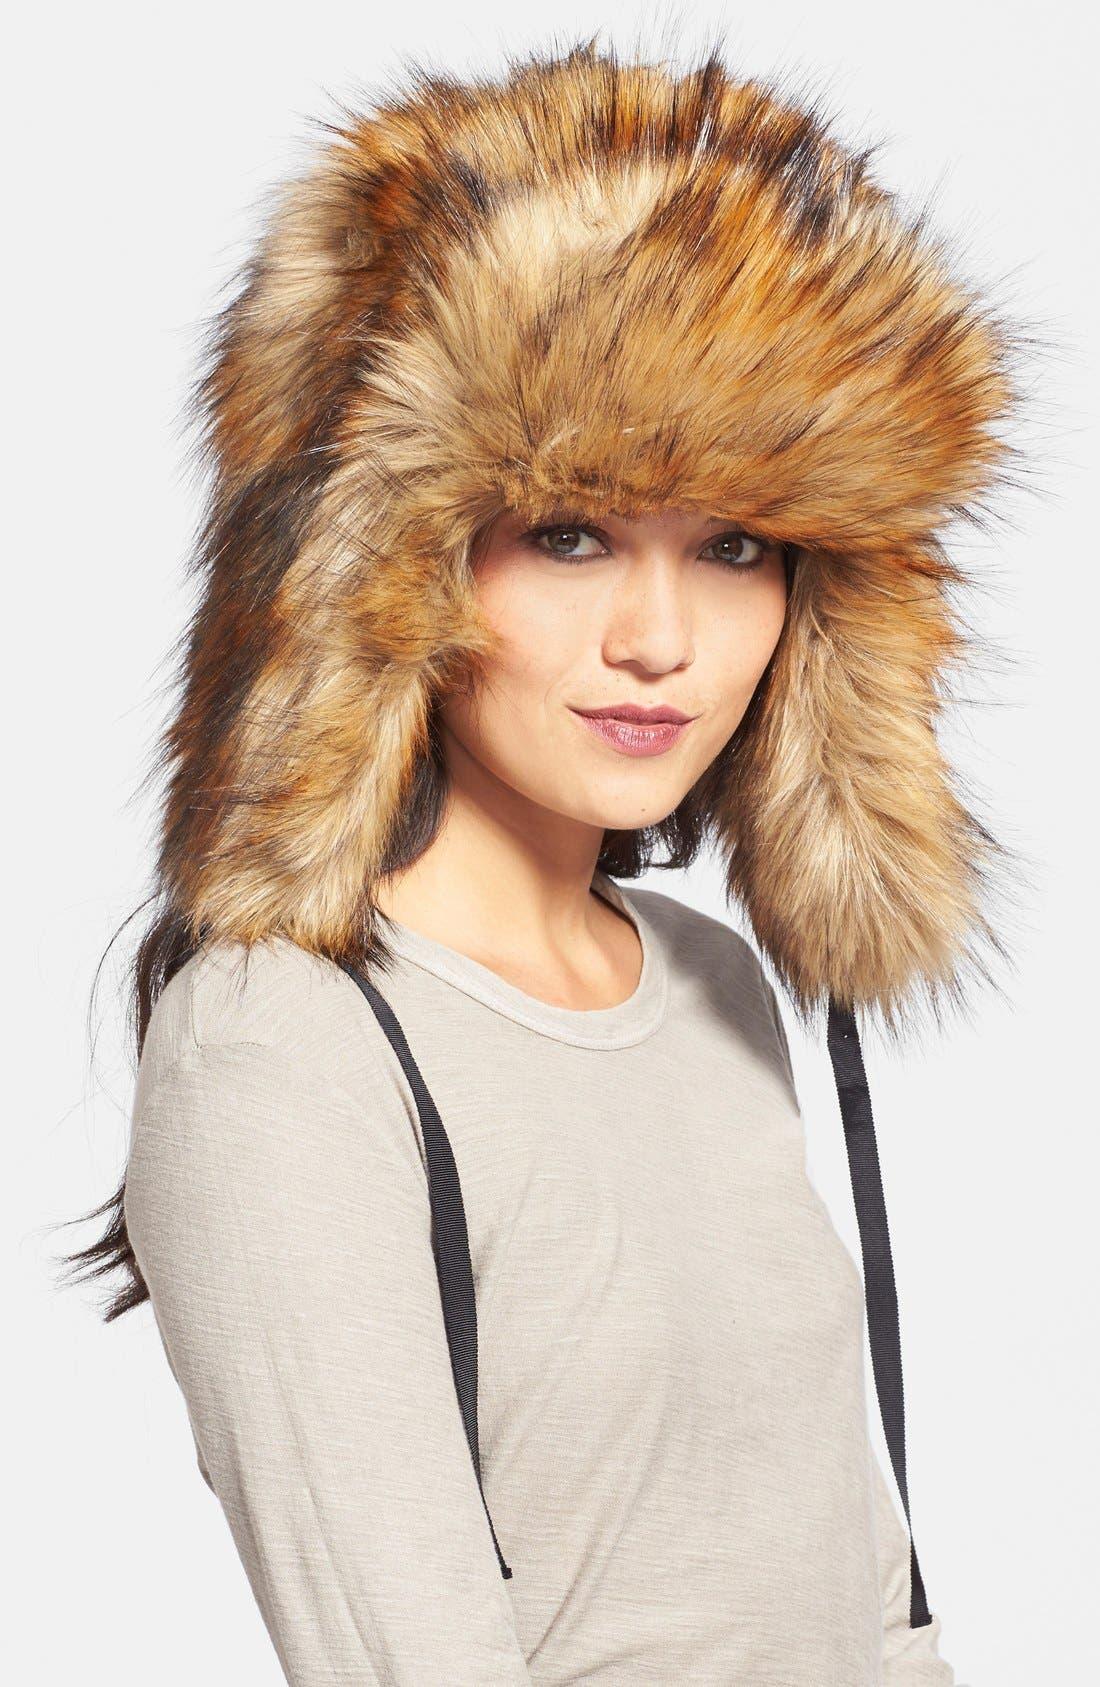 Alternate Image 1 Selected - kate spade new york 'raccoon' faux fur hat